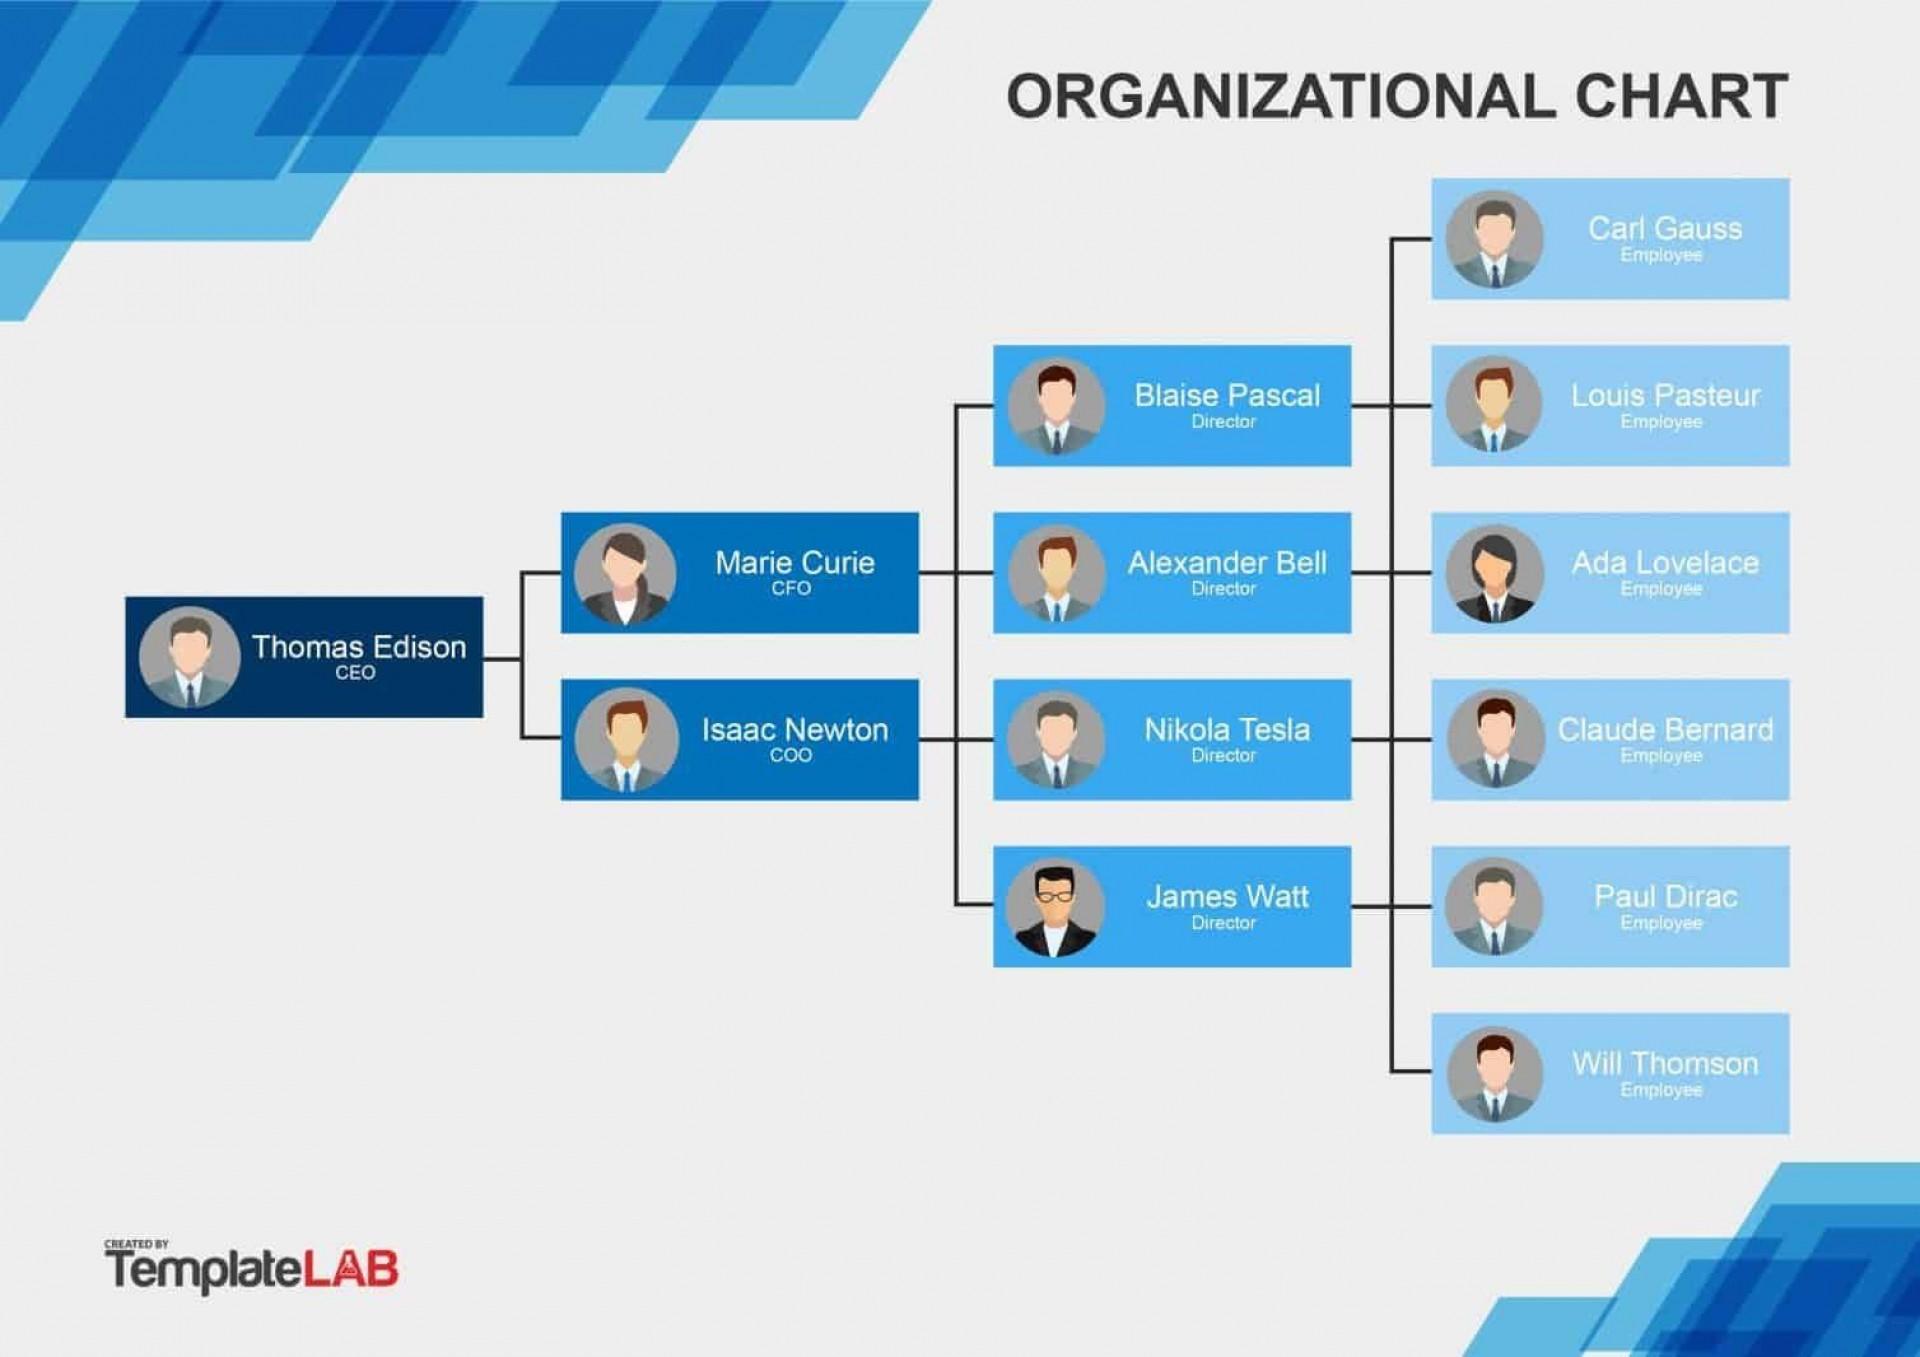 002 Marvelou Microsoft Organizational Chart Template High Resolution  Templates Visio Org M Office Organization Powerpoint1920